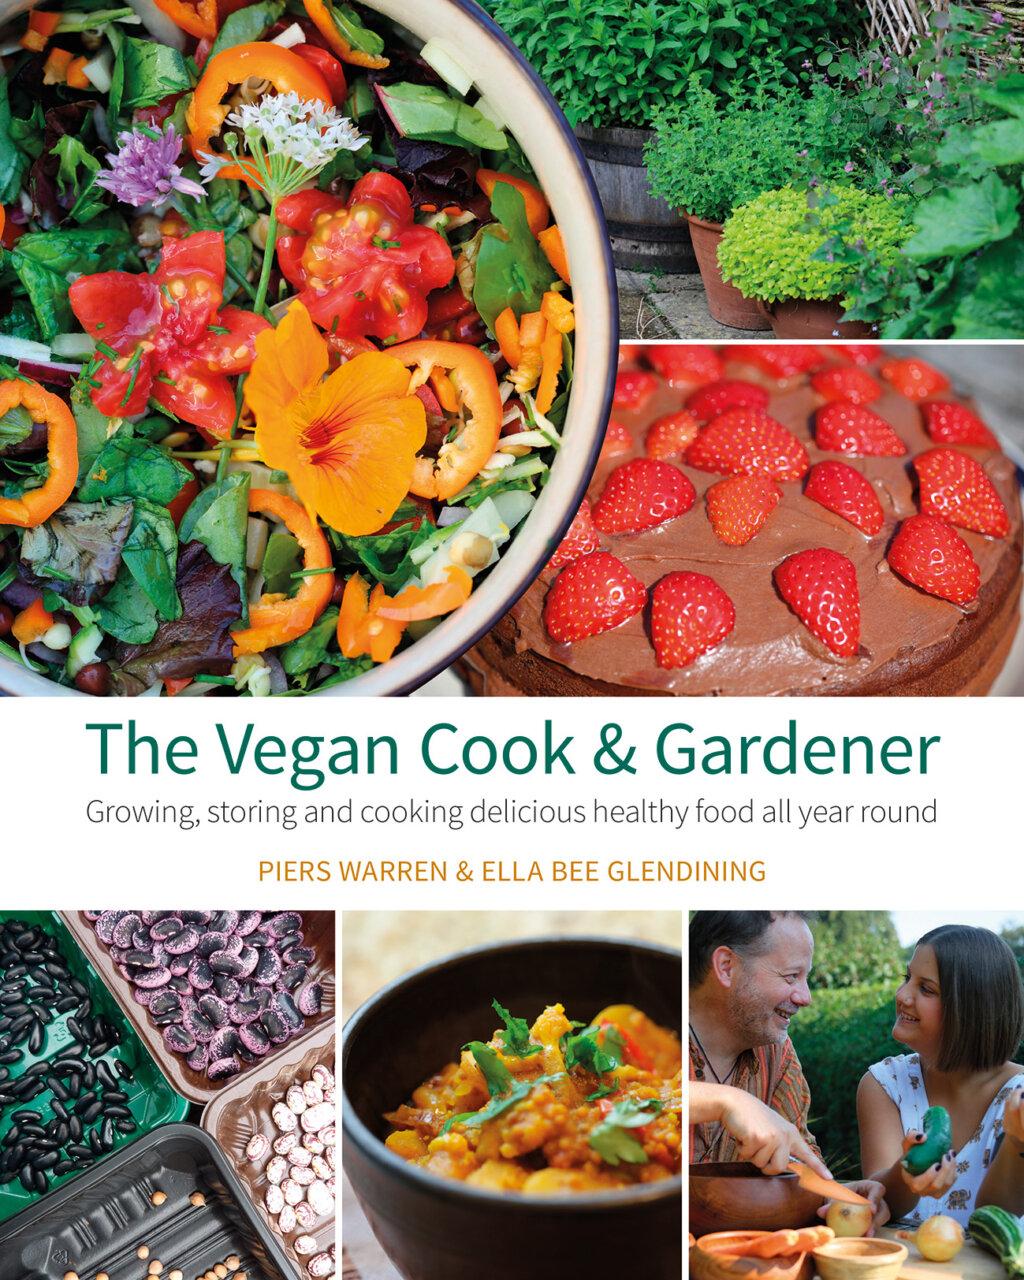 The Vegan Cook & Gardener cover